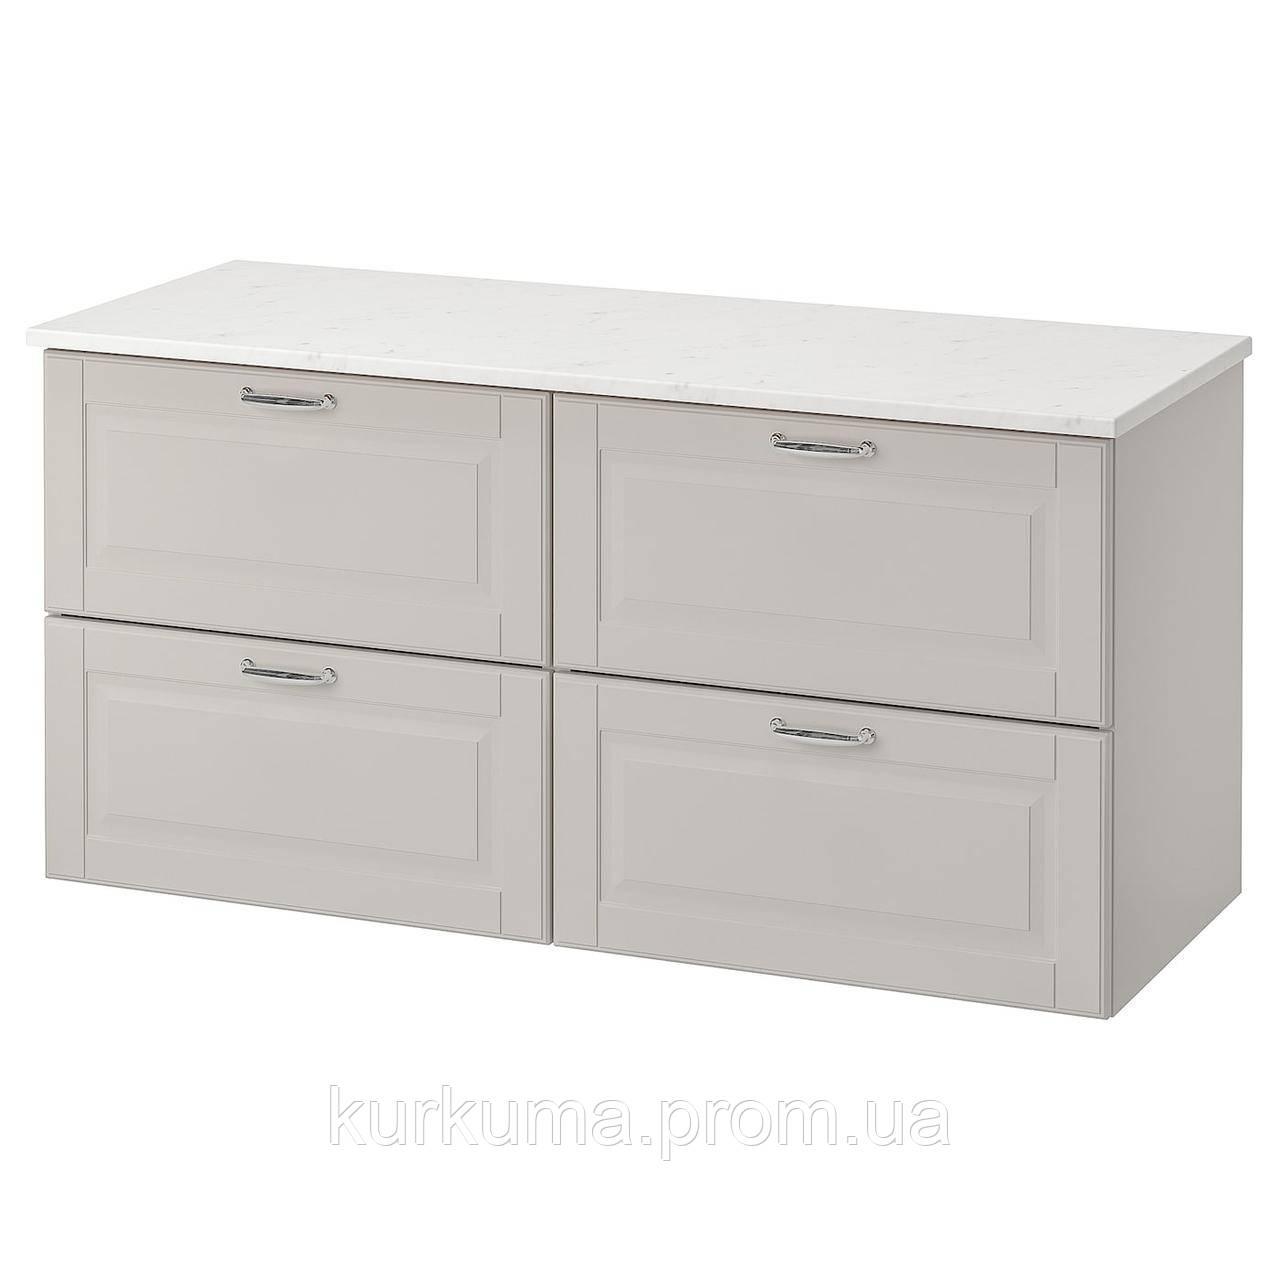 Шкаф под умывальник IKEA GODMORGON / TOLKEN (192.956.10)